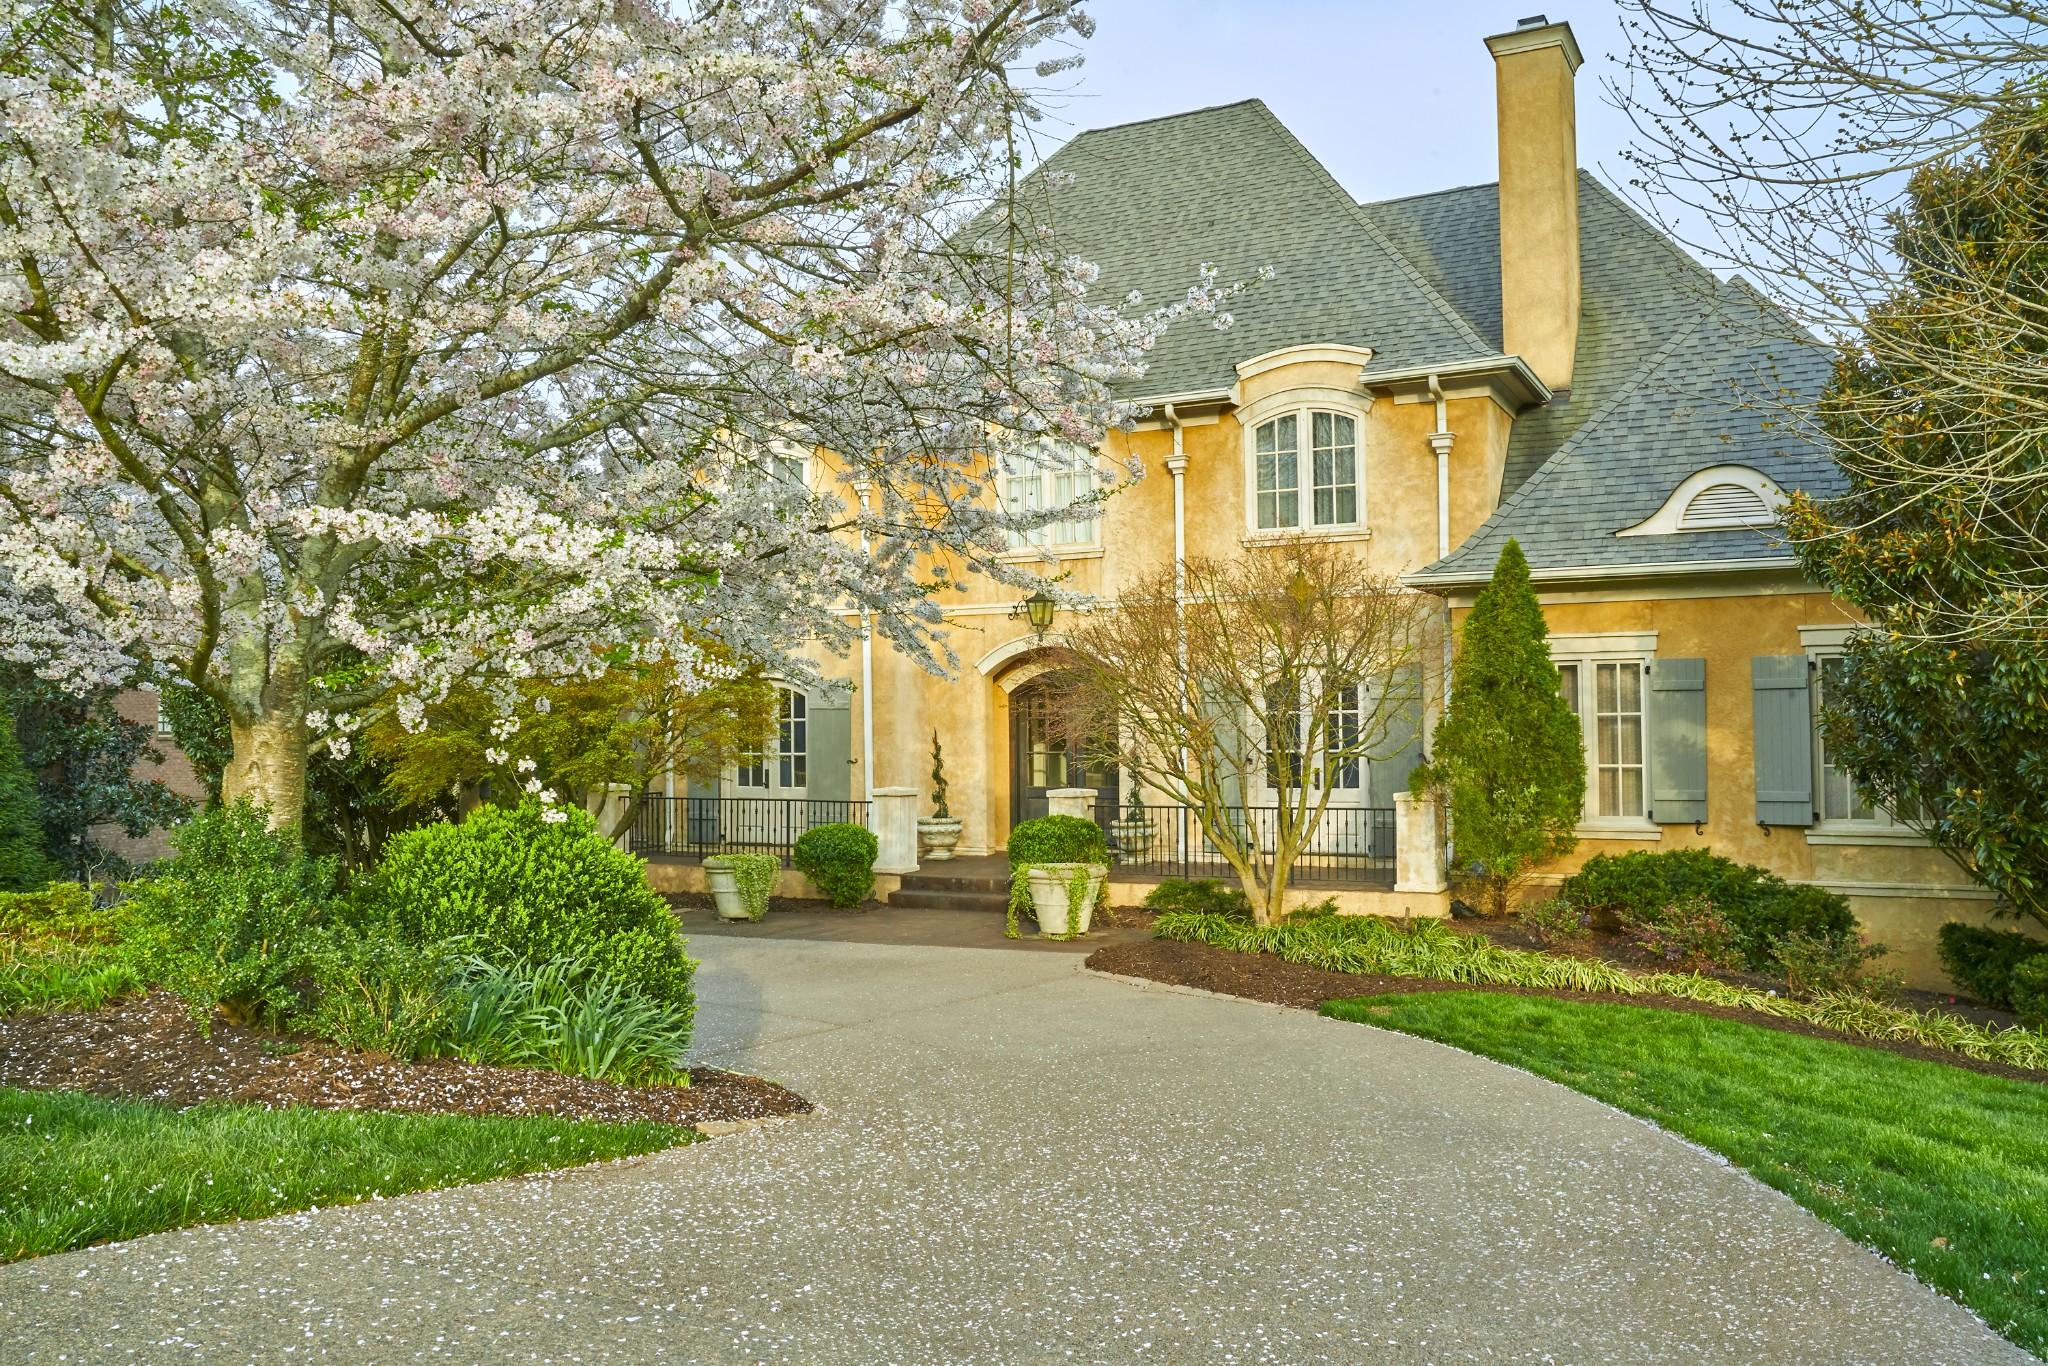 1405 Willowbrooke Cir Property Photo - Franklin, TN real estate listing